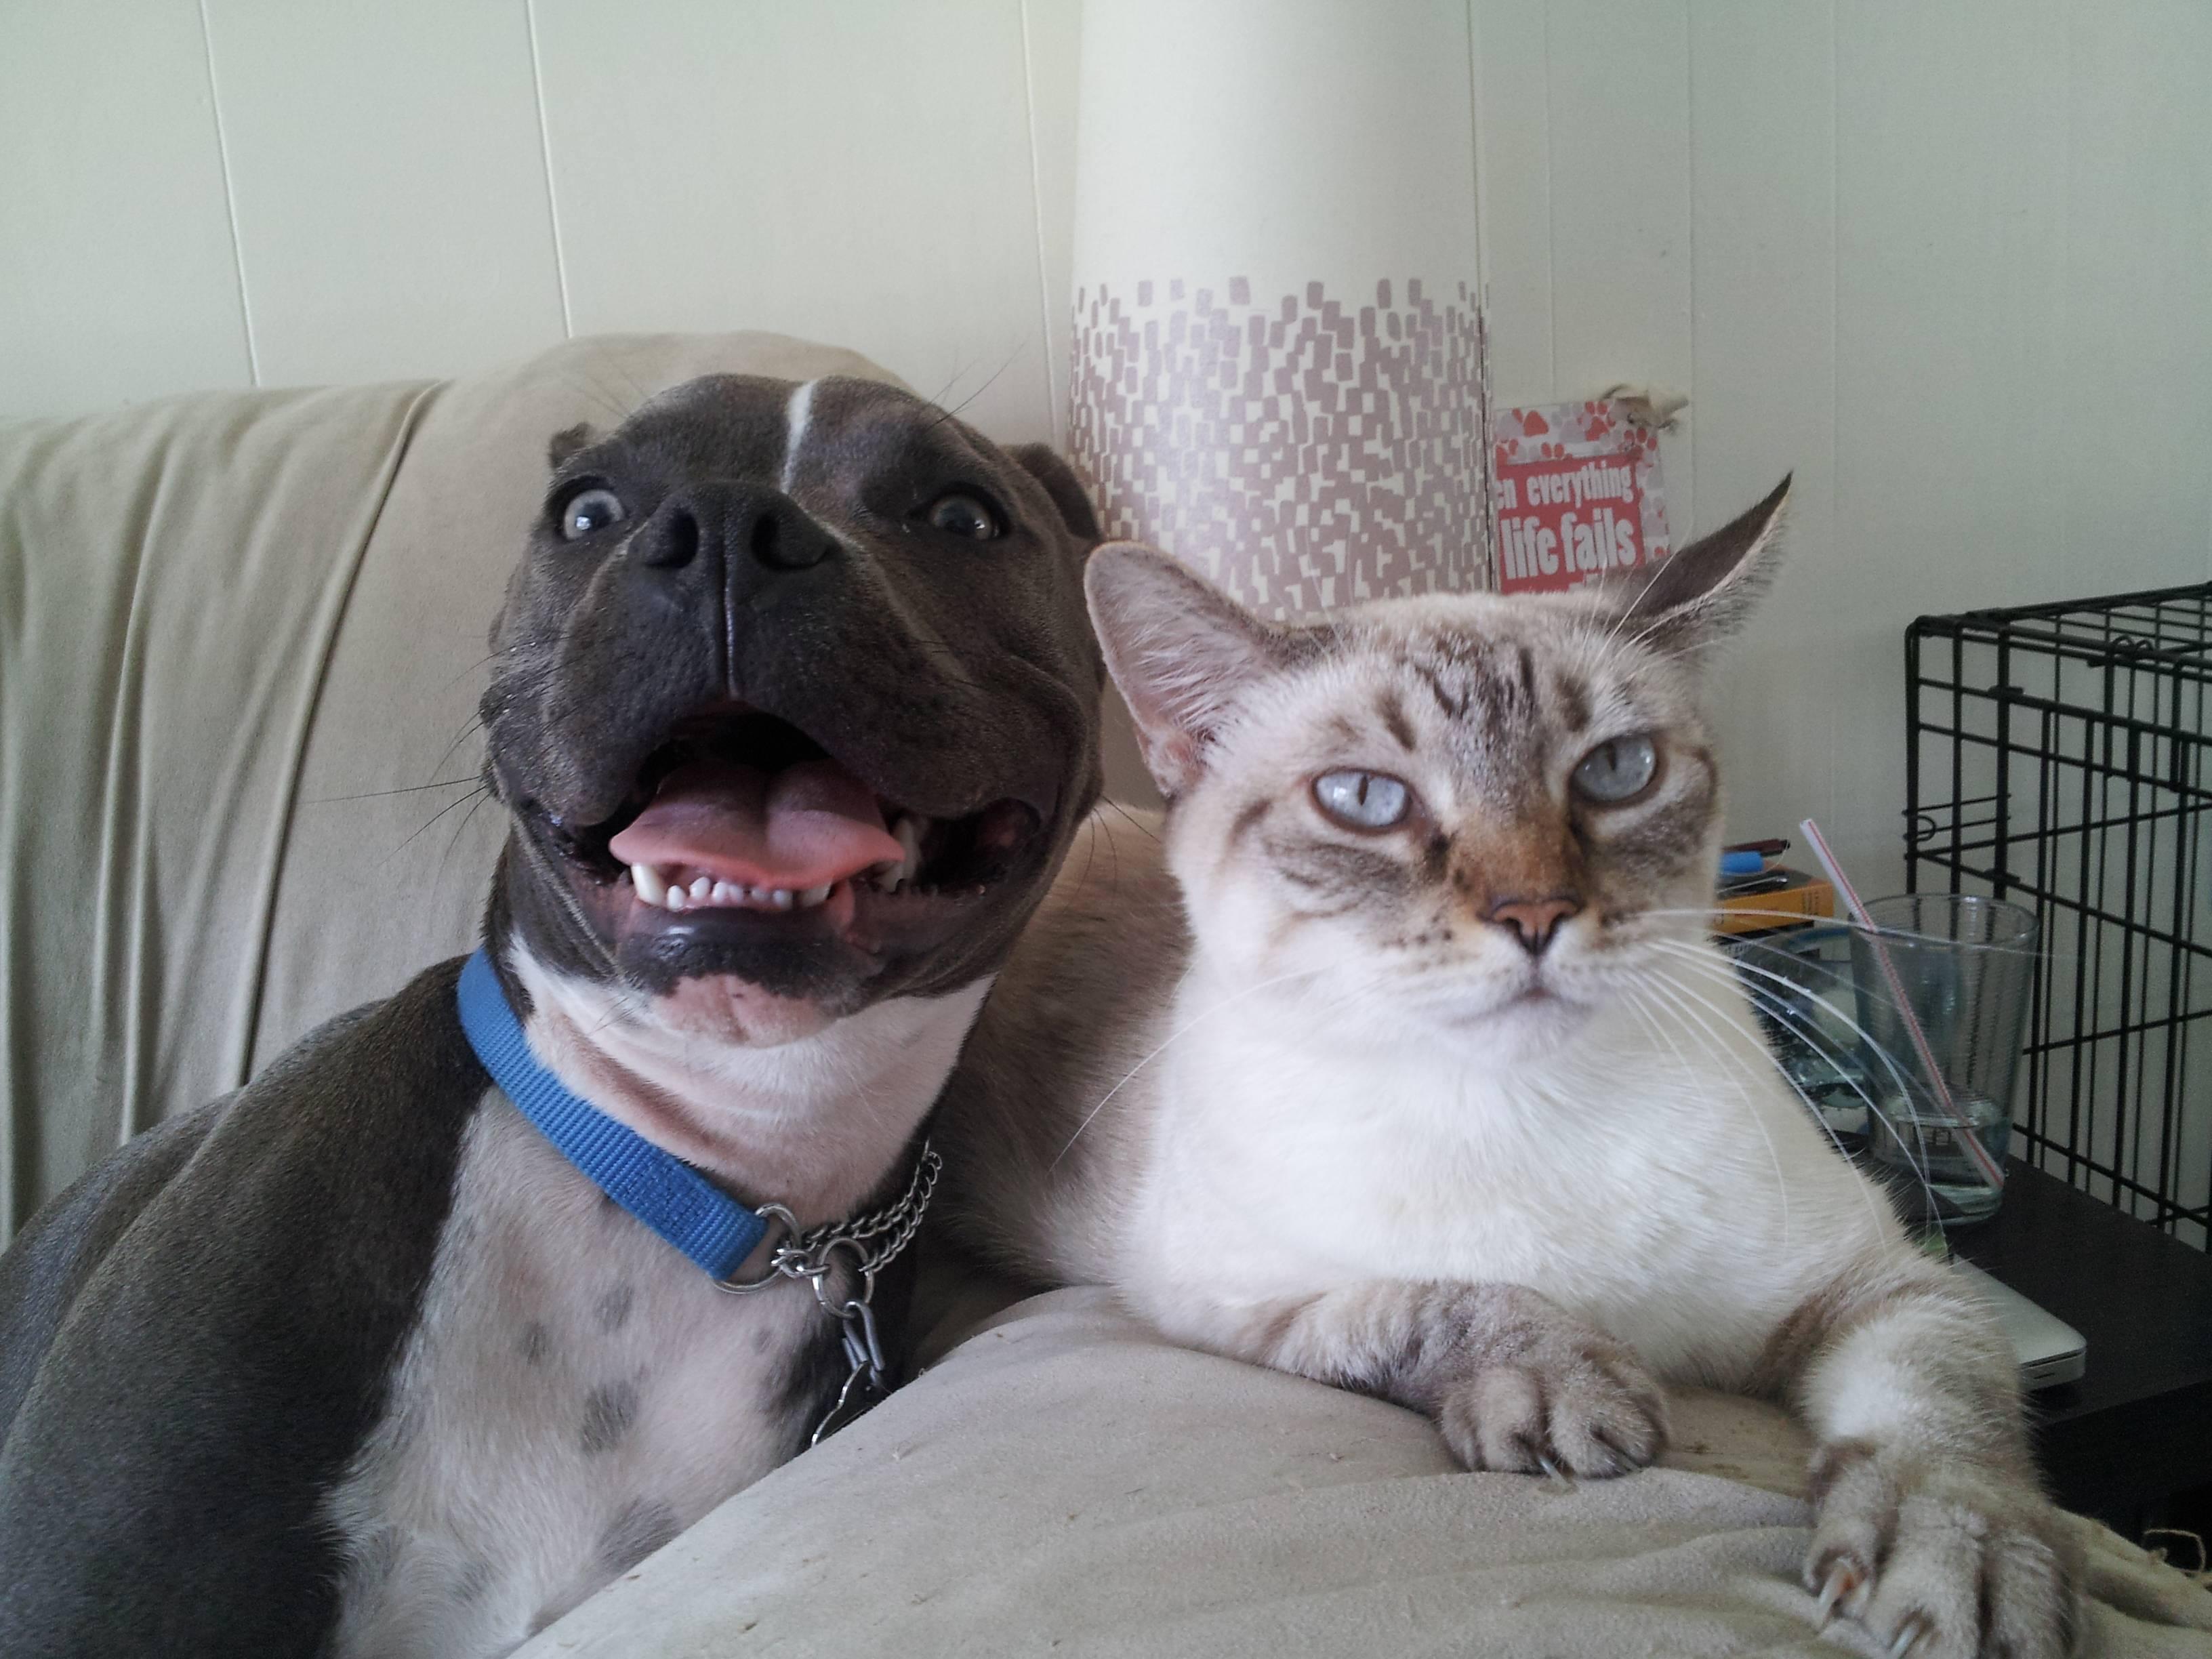 Pitbull Dog Quotes Cat Hates Pitbull Dog's Happiness So Much